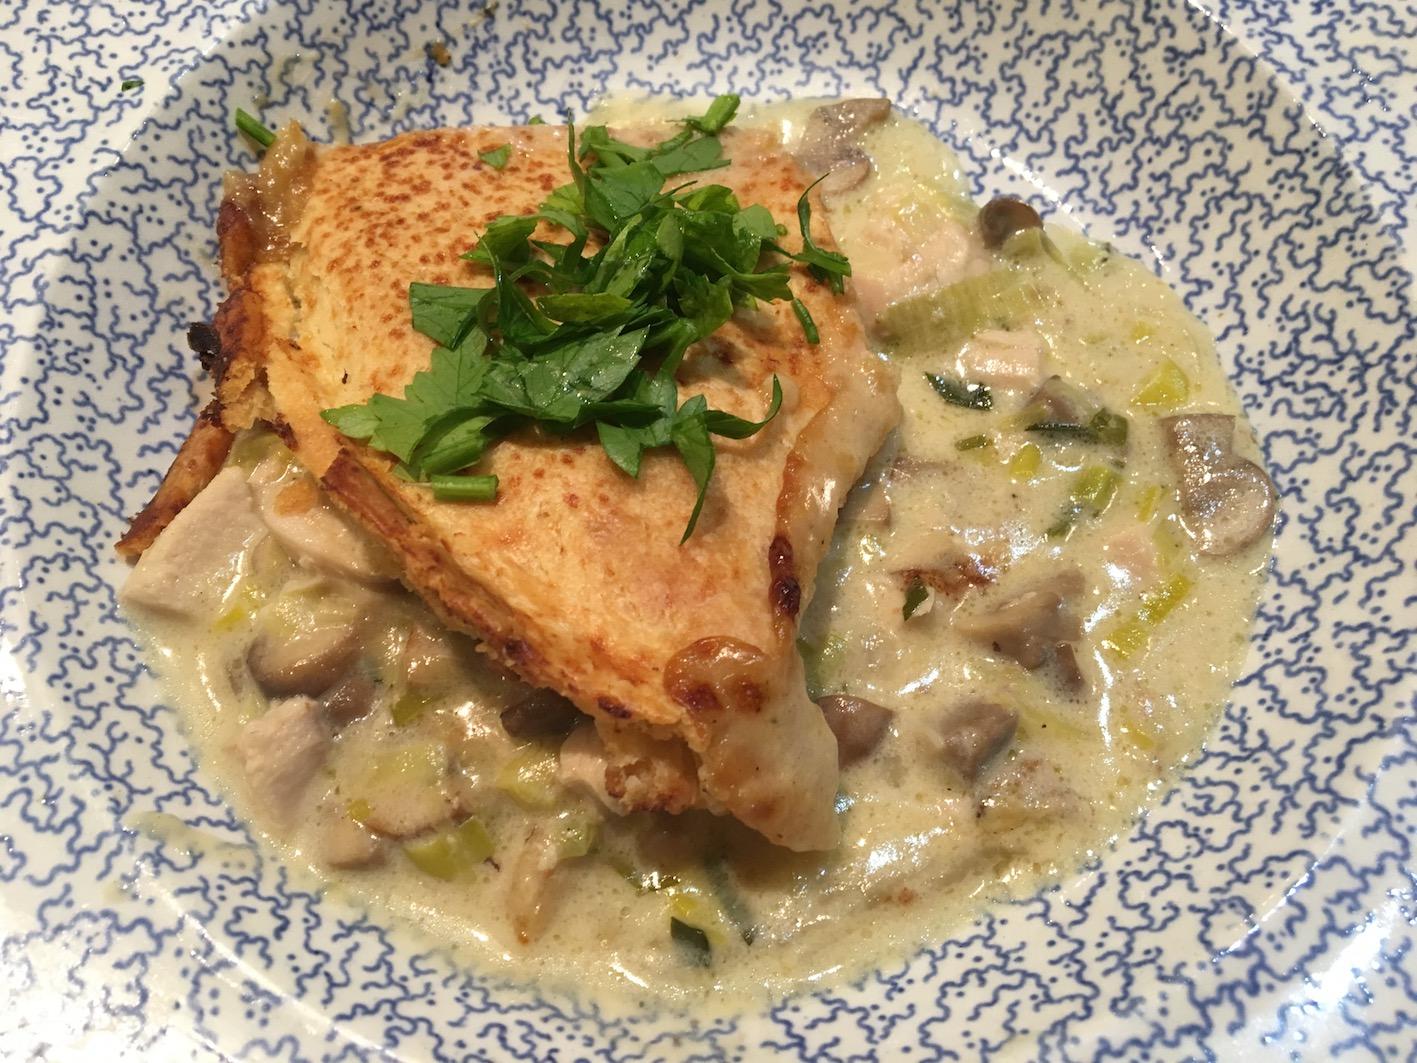 Chicken Pot Pie with tarragon & mushrooms